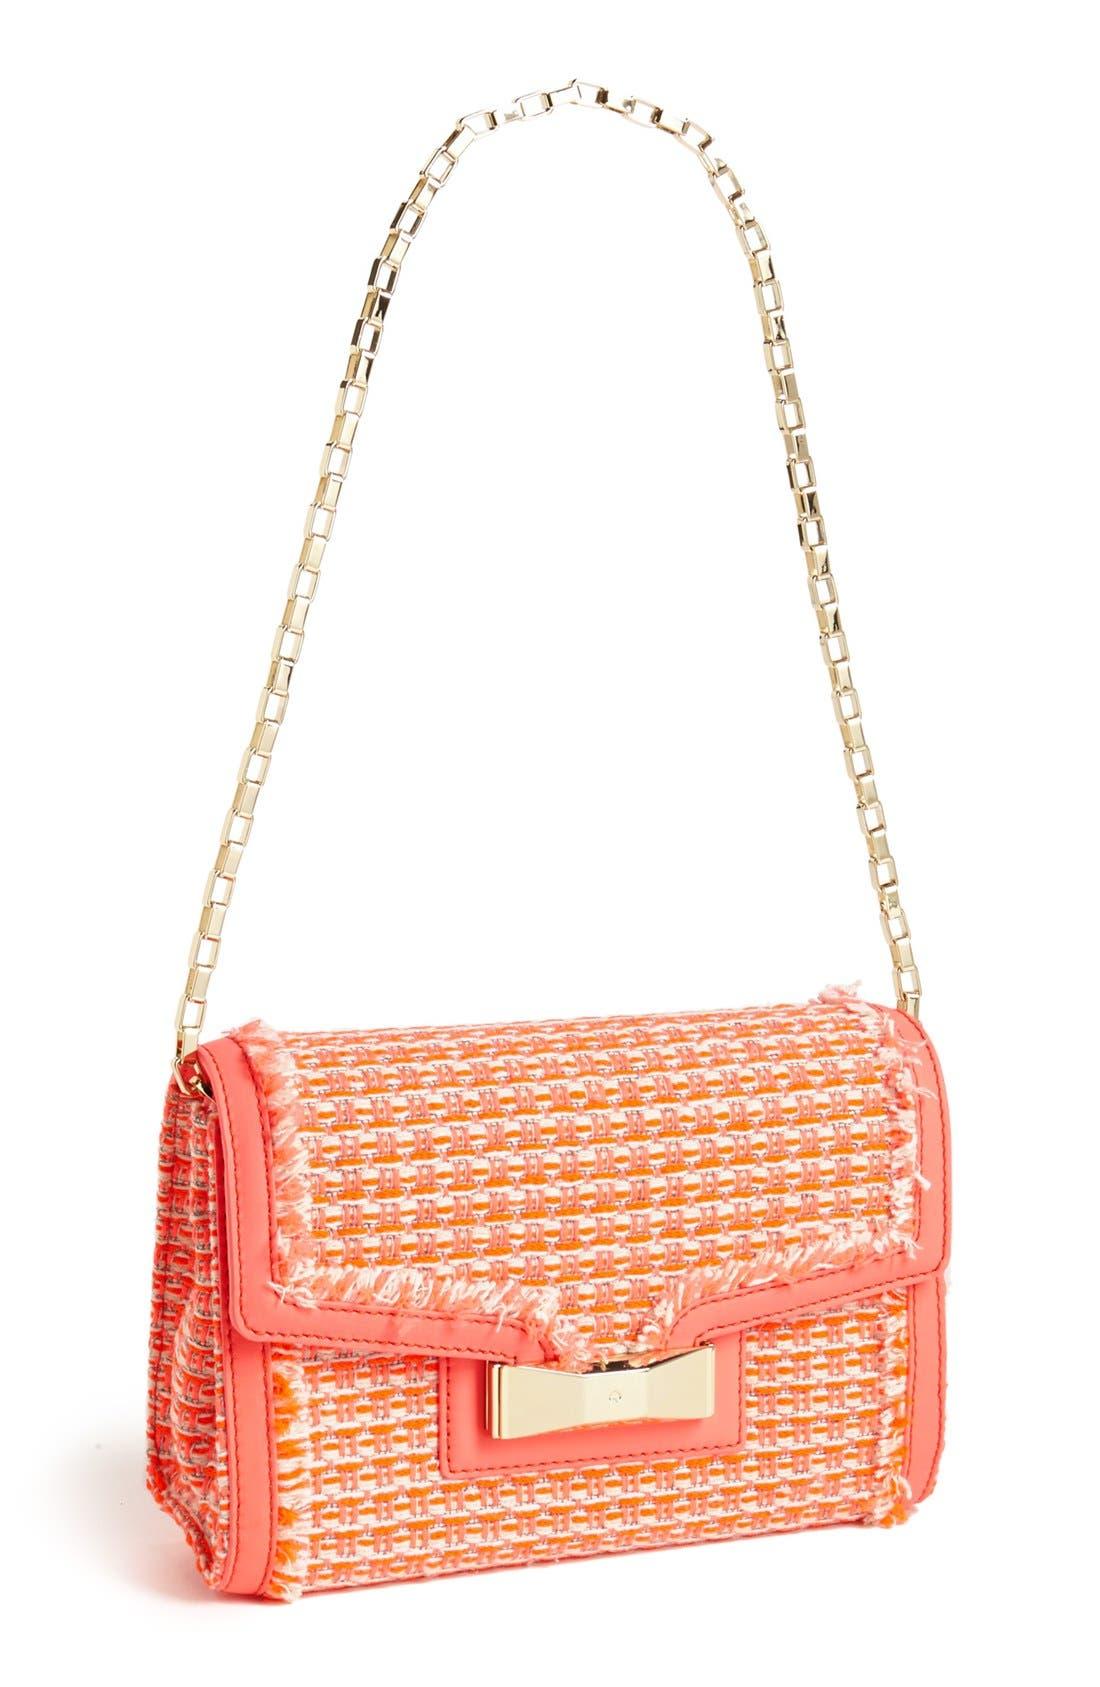 Alternate Image 1 Selected - kate spade new york 'carroll park - scarlette' tweed shoulder bag